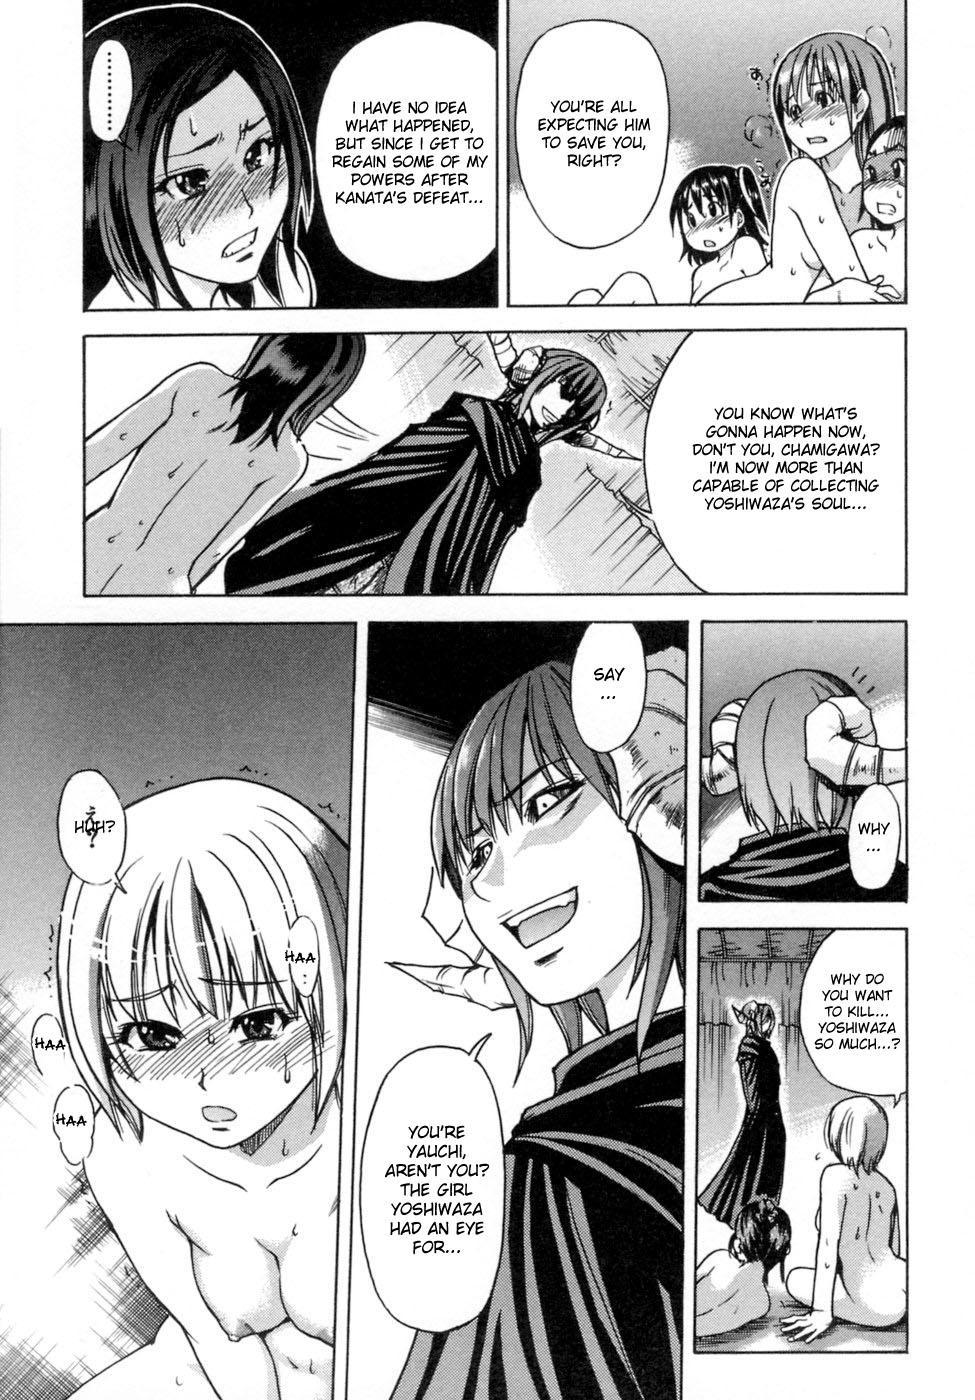 Shining Musume. 5. Five Sense of Love 27